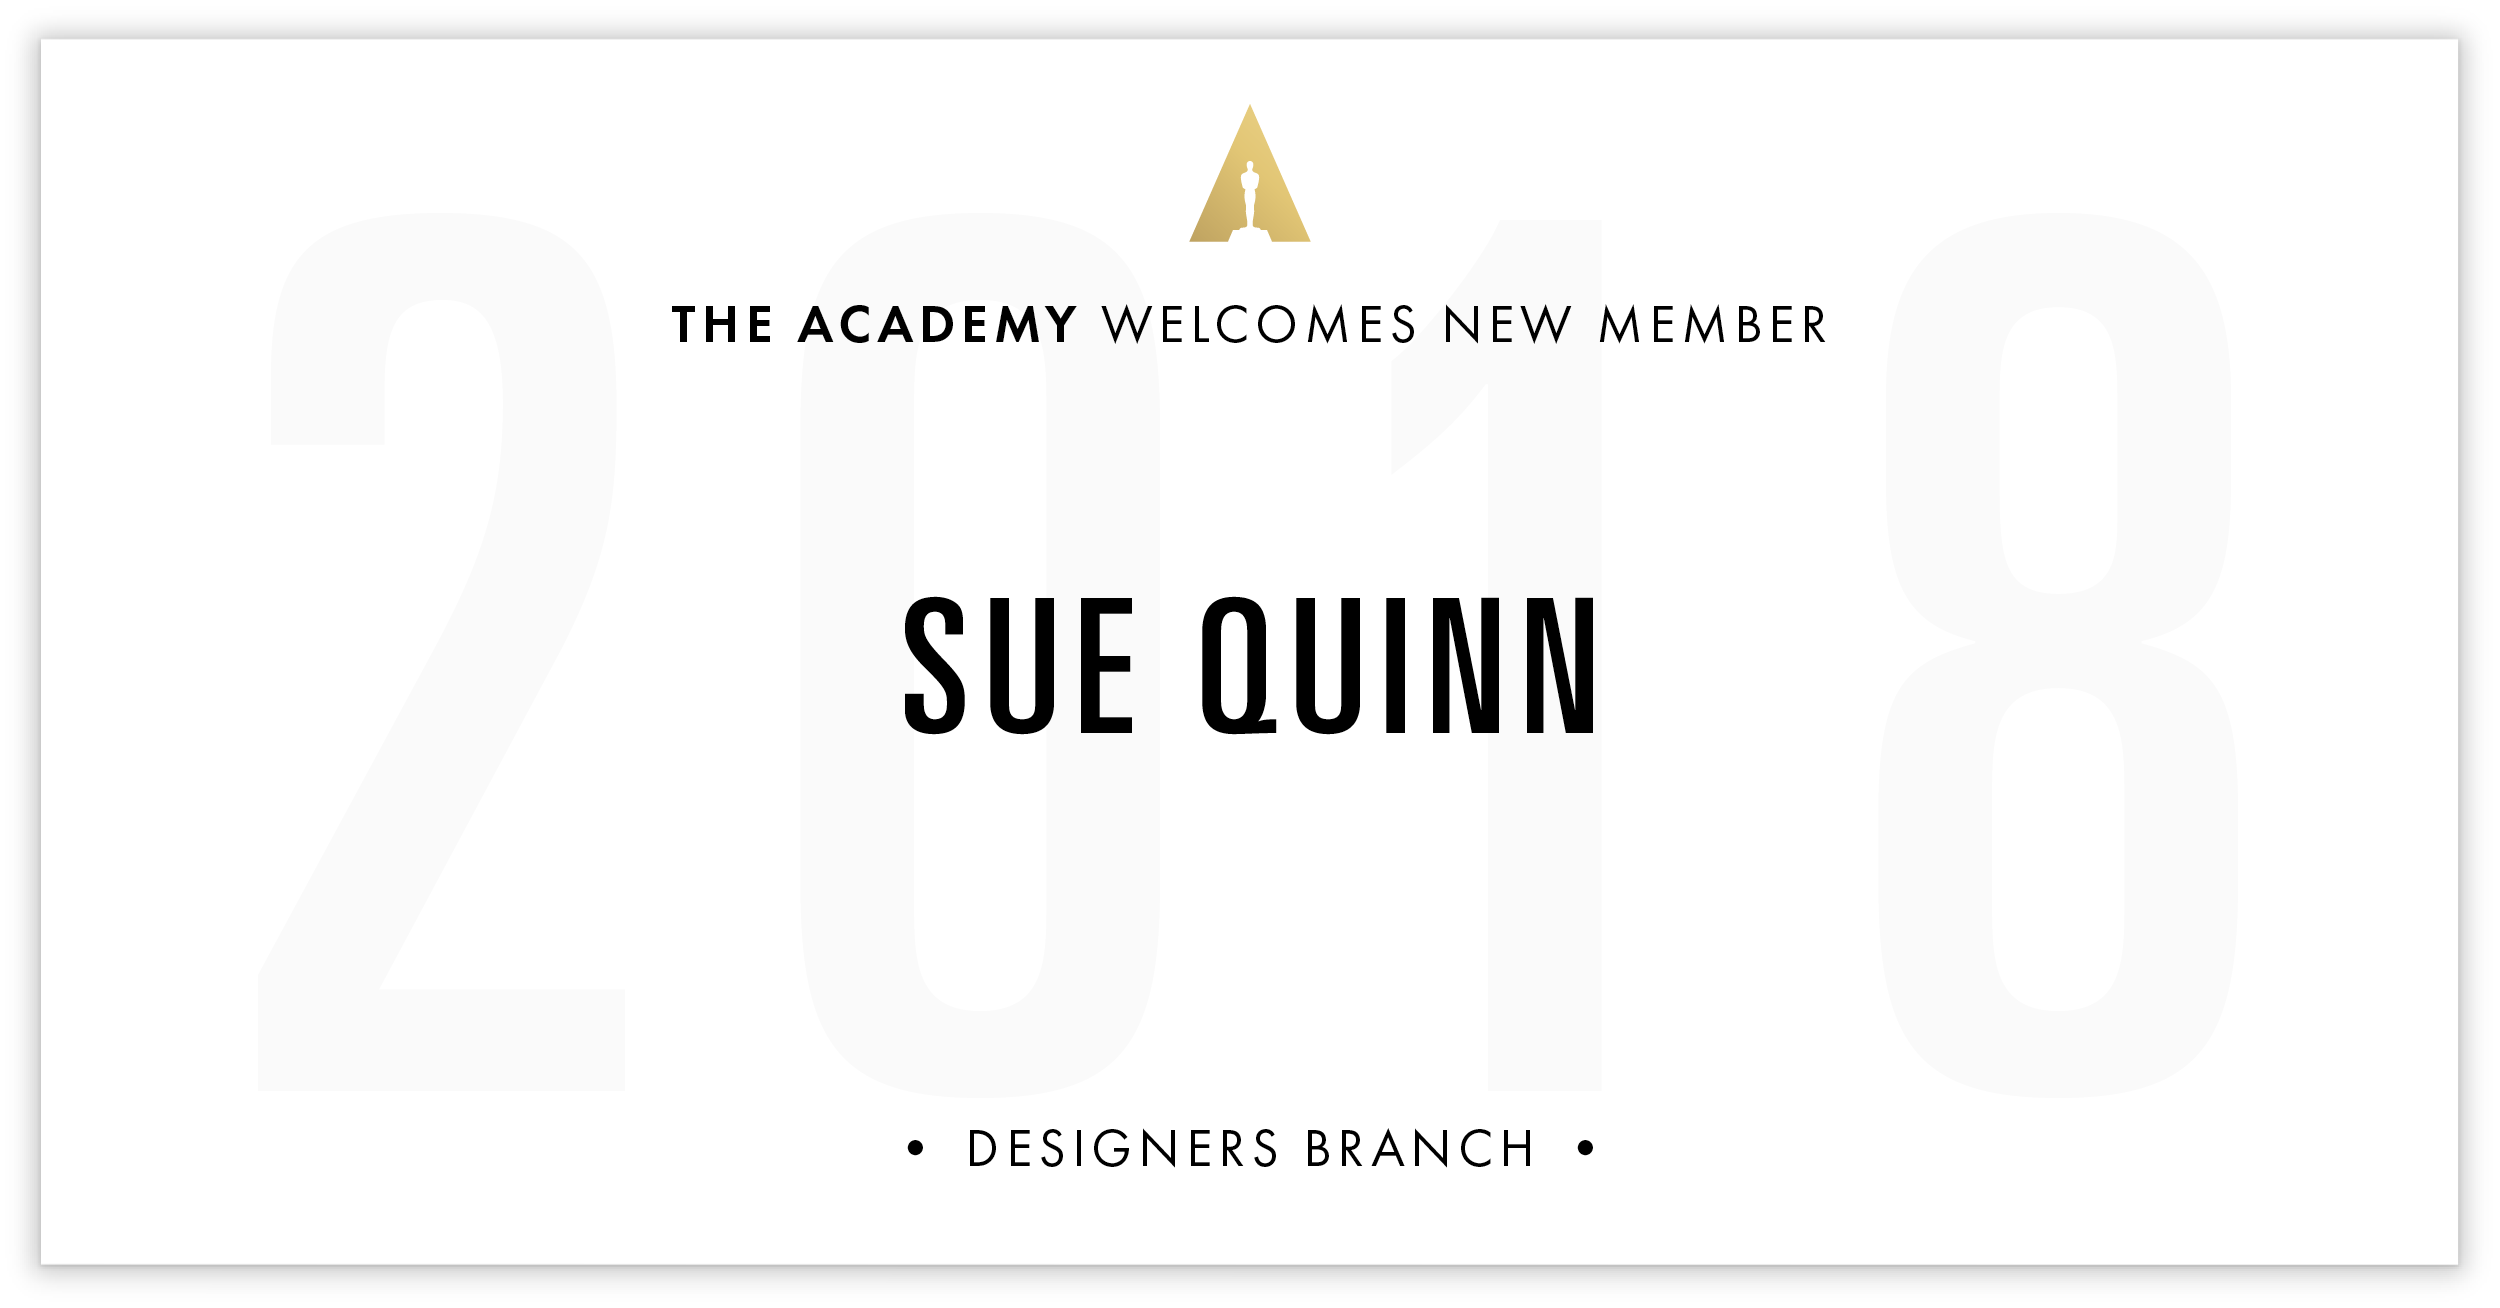 Sue Quinn is invited!